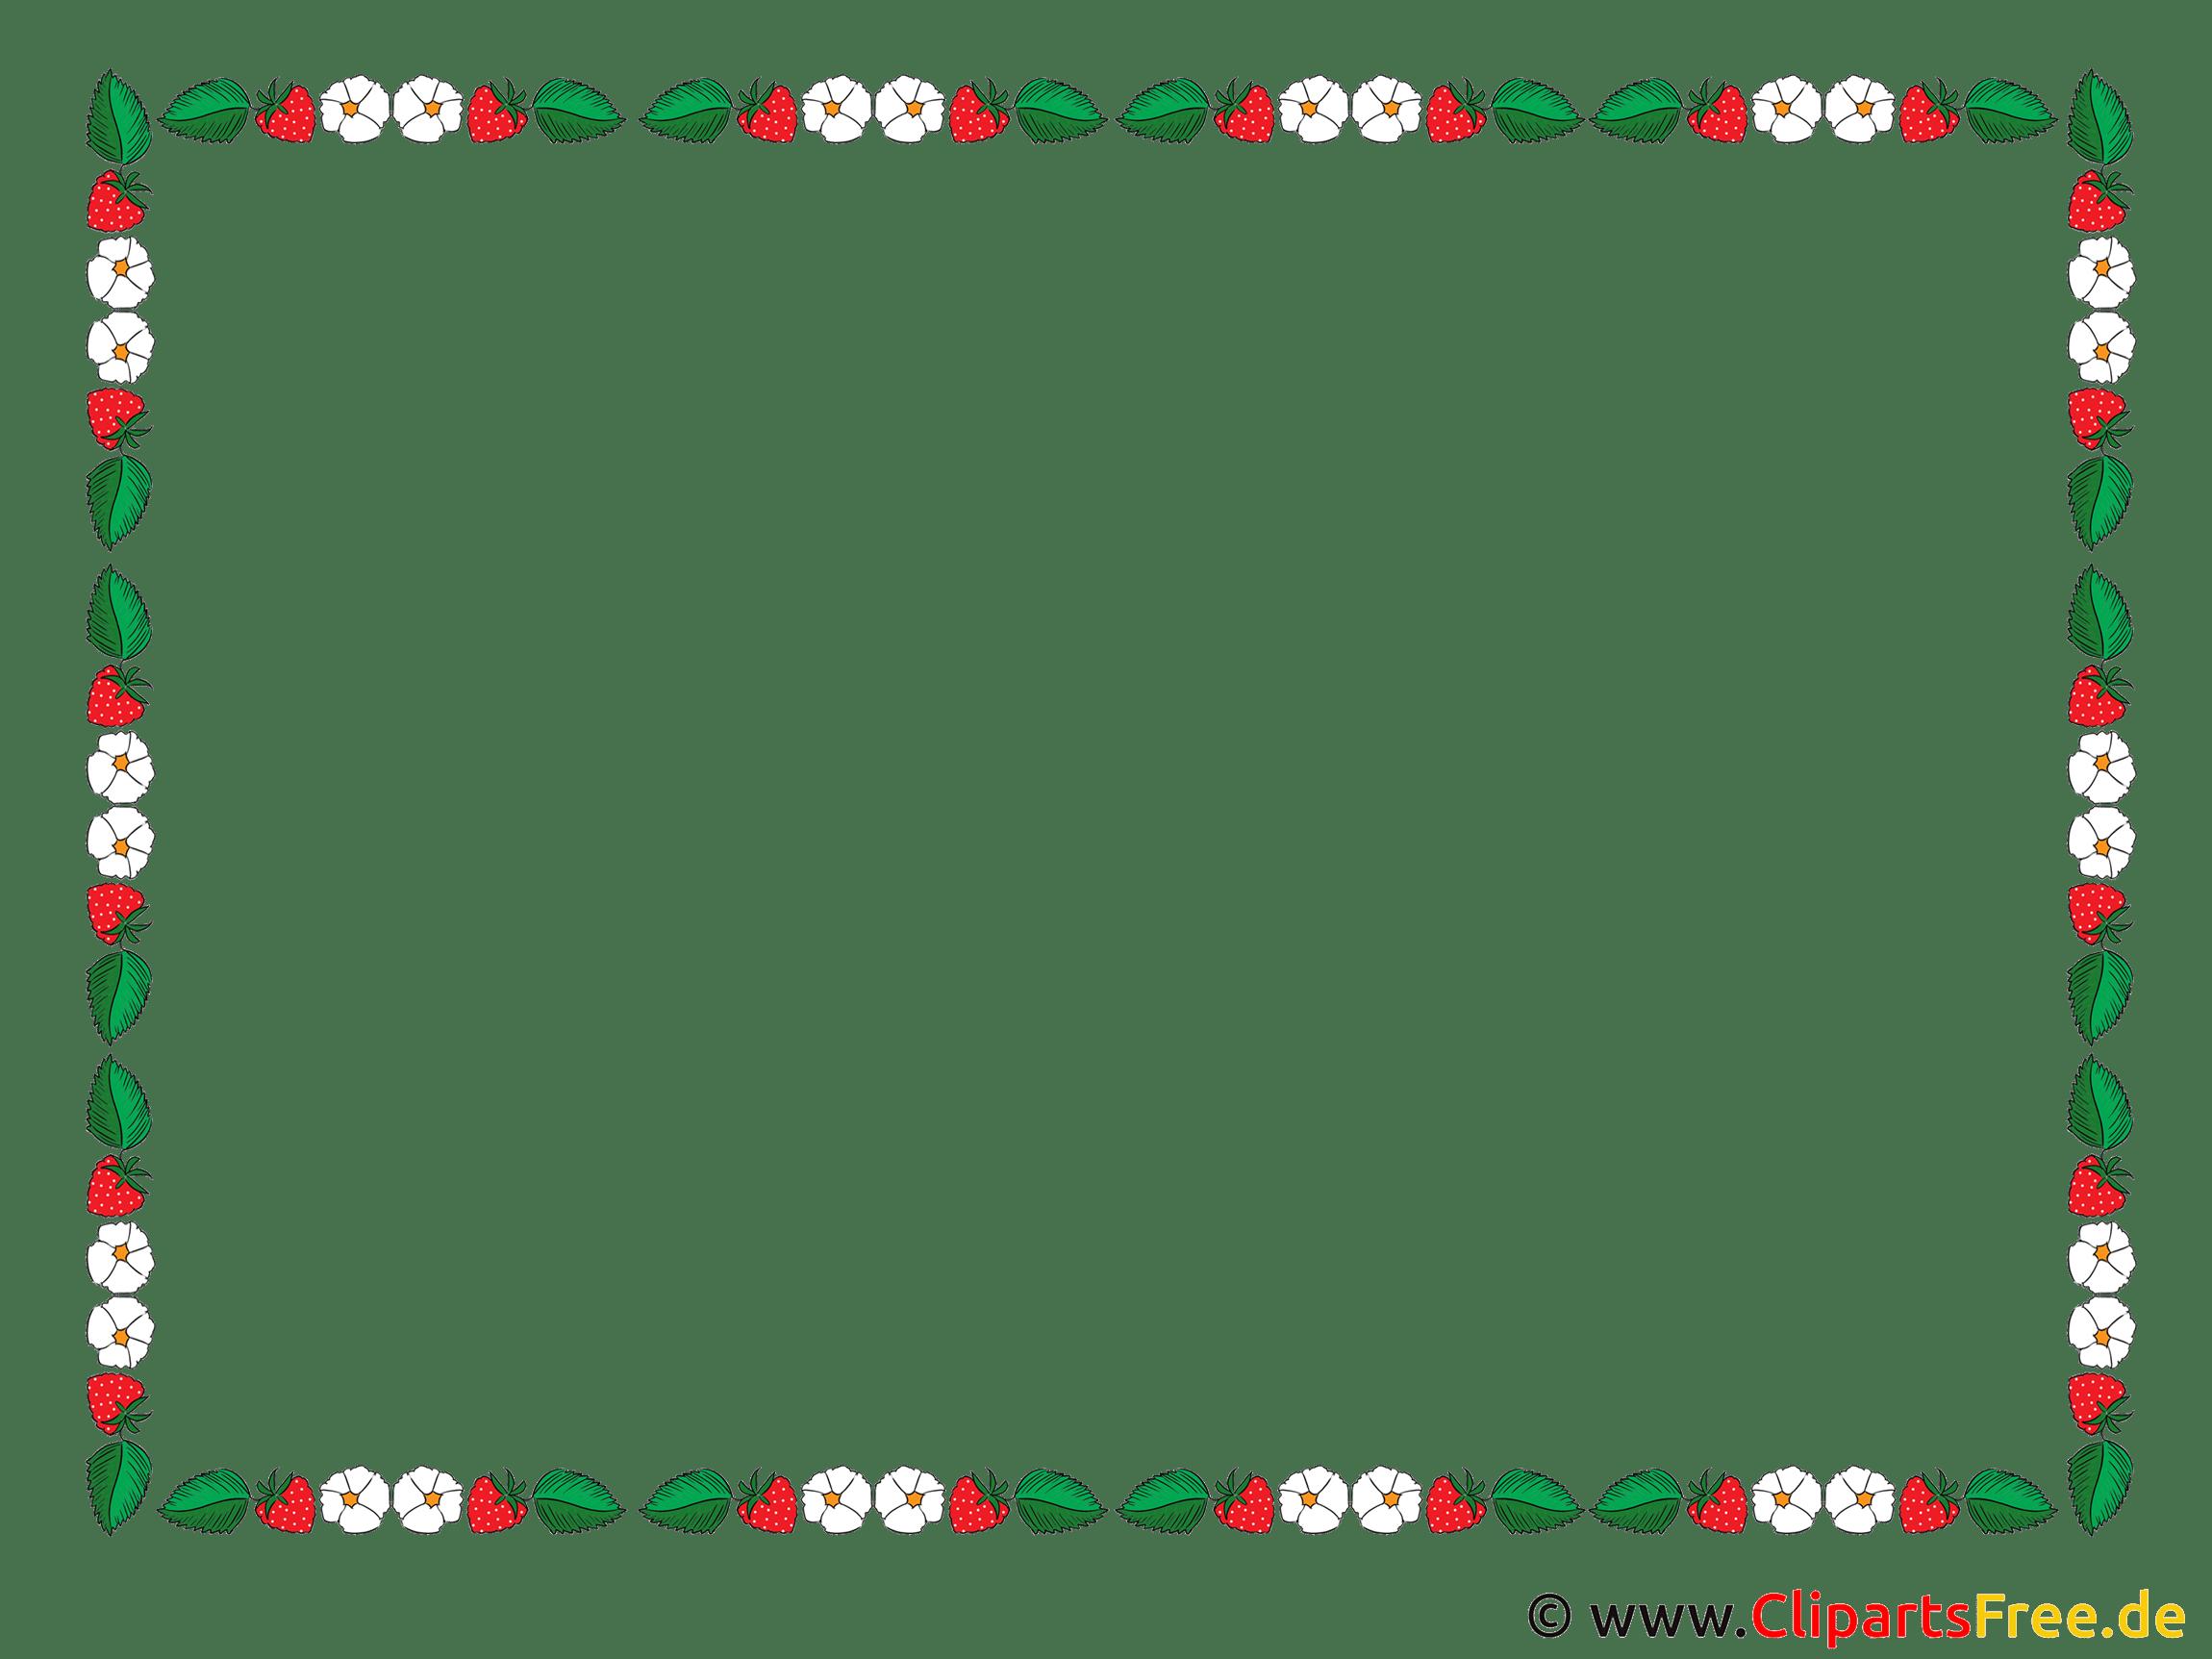 Rahmen Clipart mit Erdbeeren Blumen Bltter